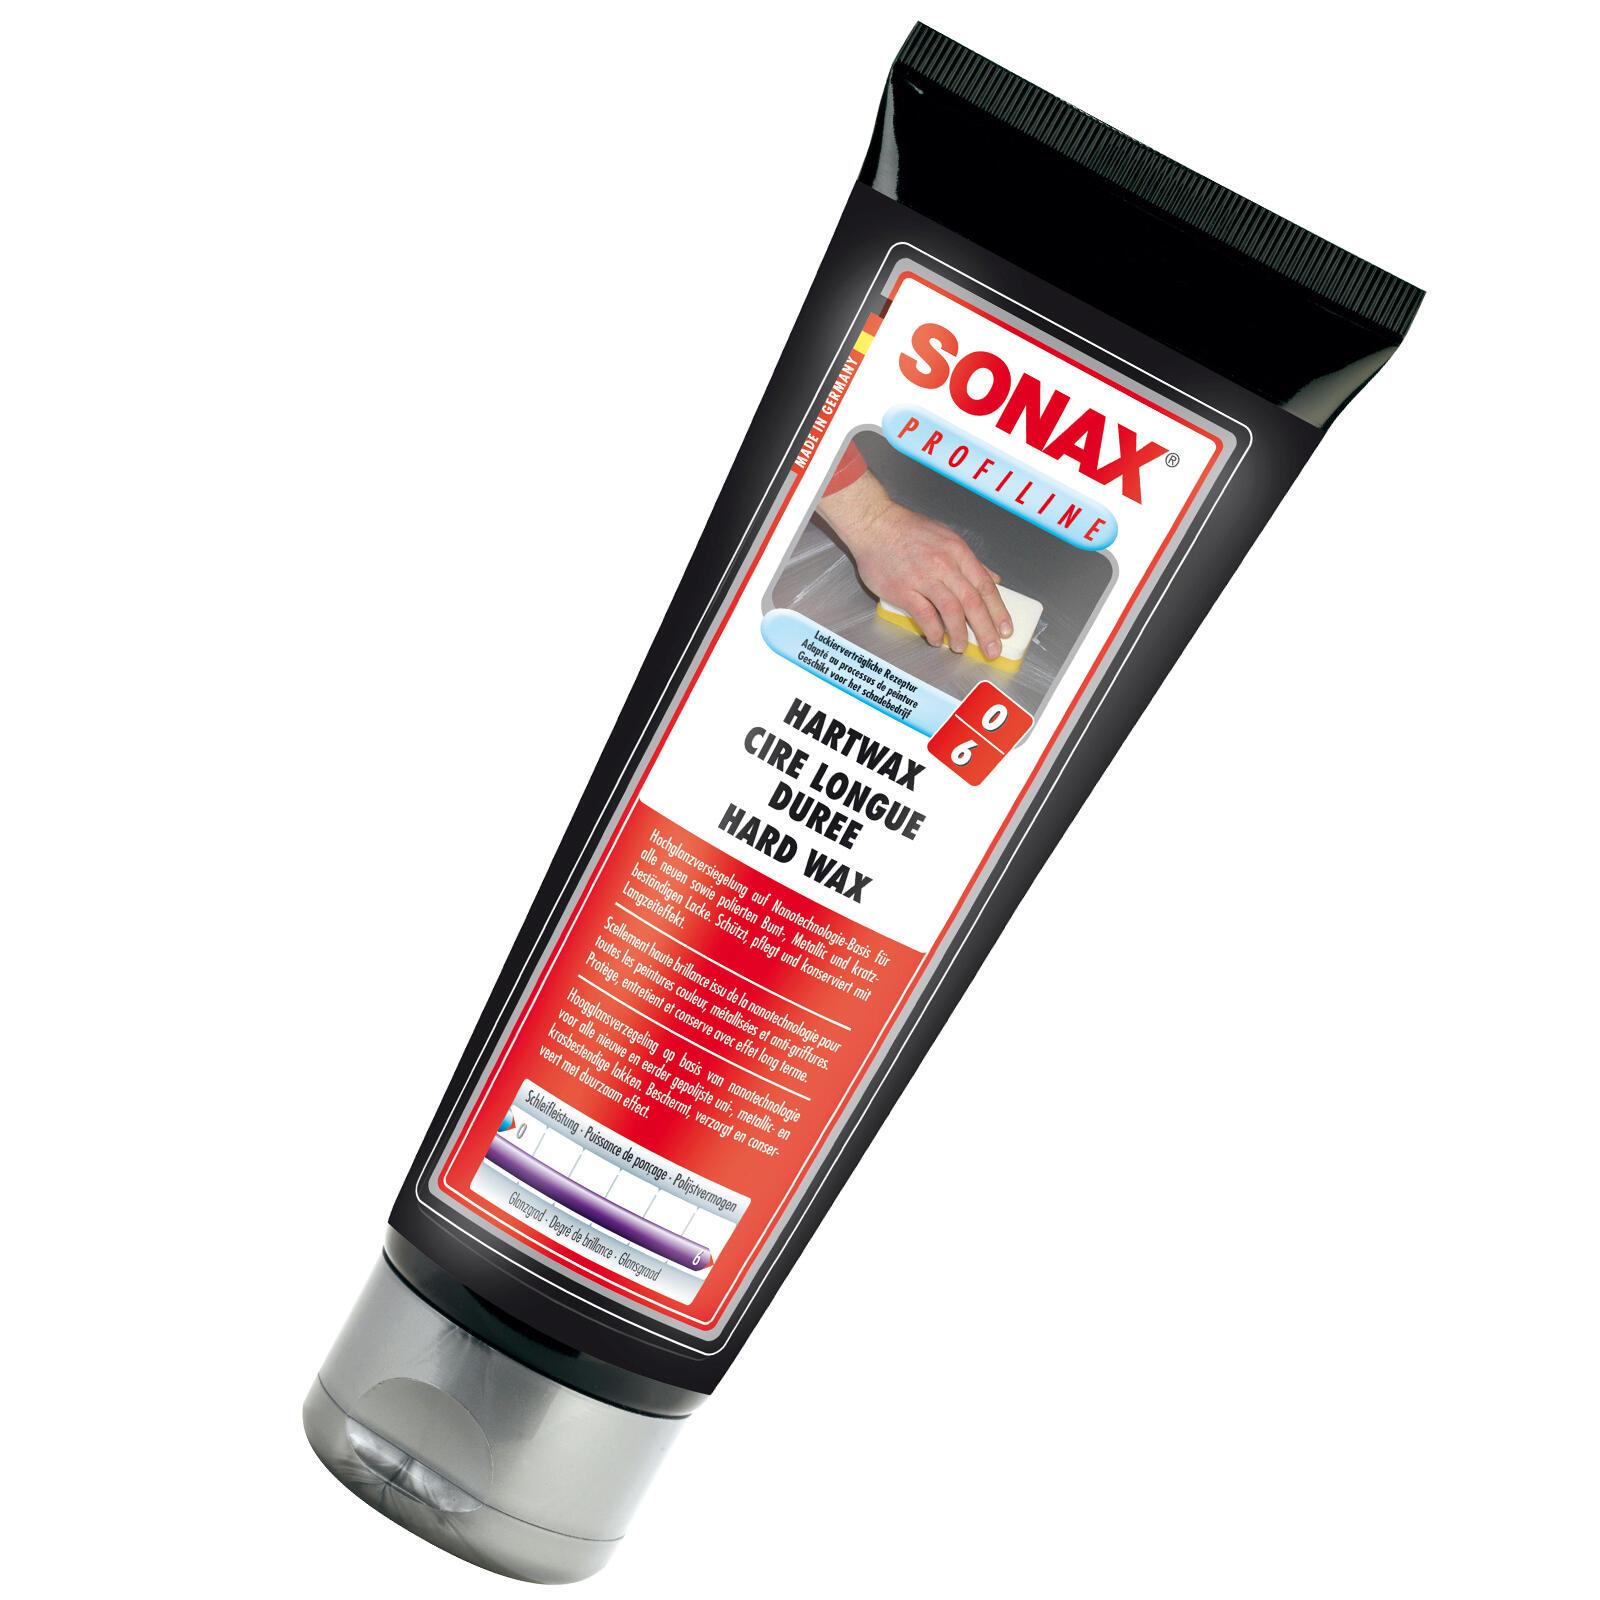 SONAX PROFILINE HW 02-04 250ml